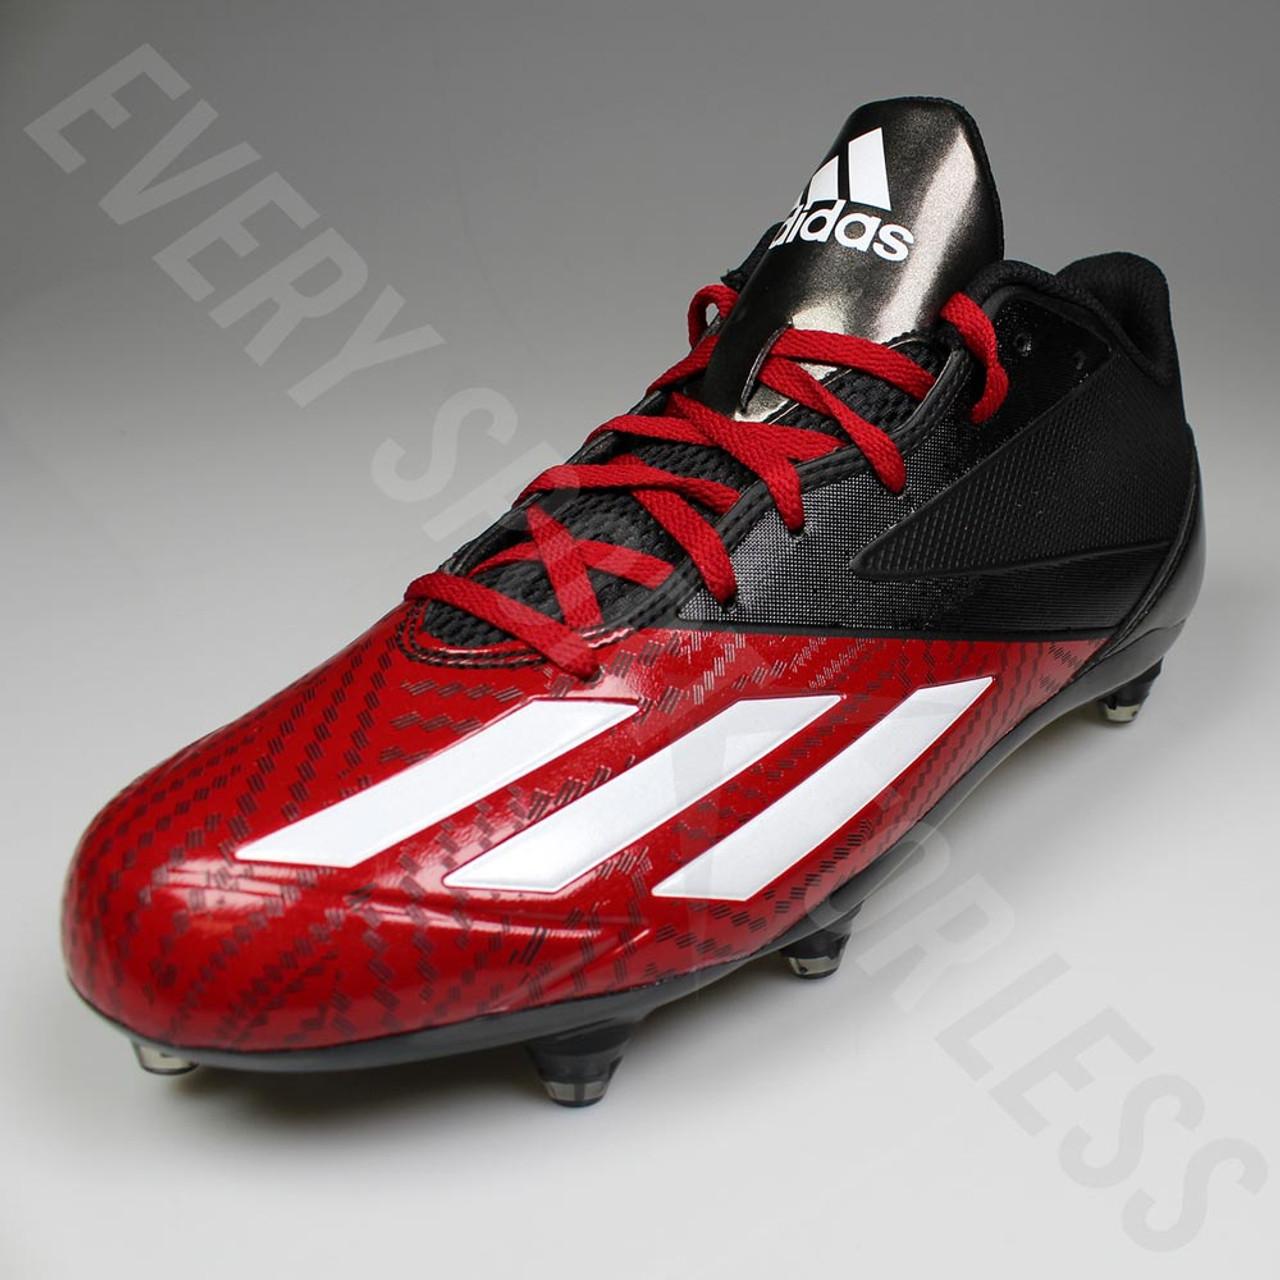 new concept 1df79 42e06 ... Adidas Adizero 5-Star Low D Football Lacrosse Cleats D70140 - Black,  Red ...